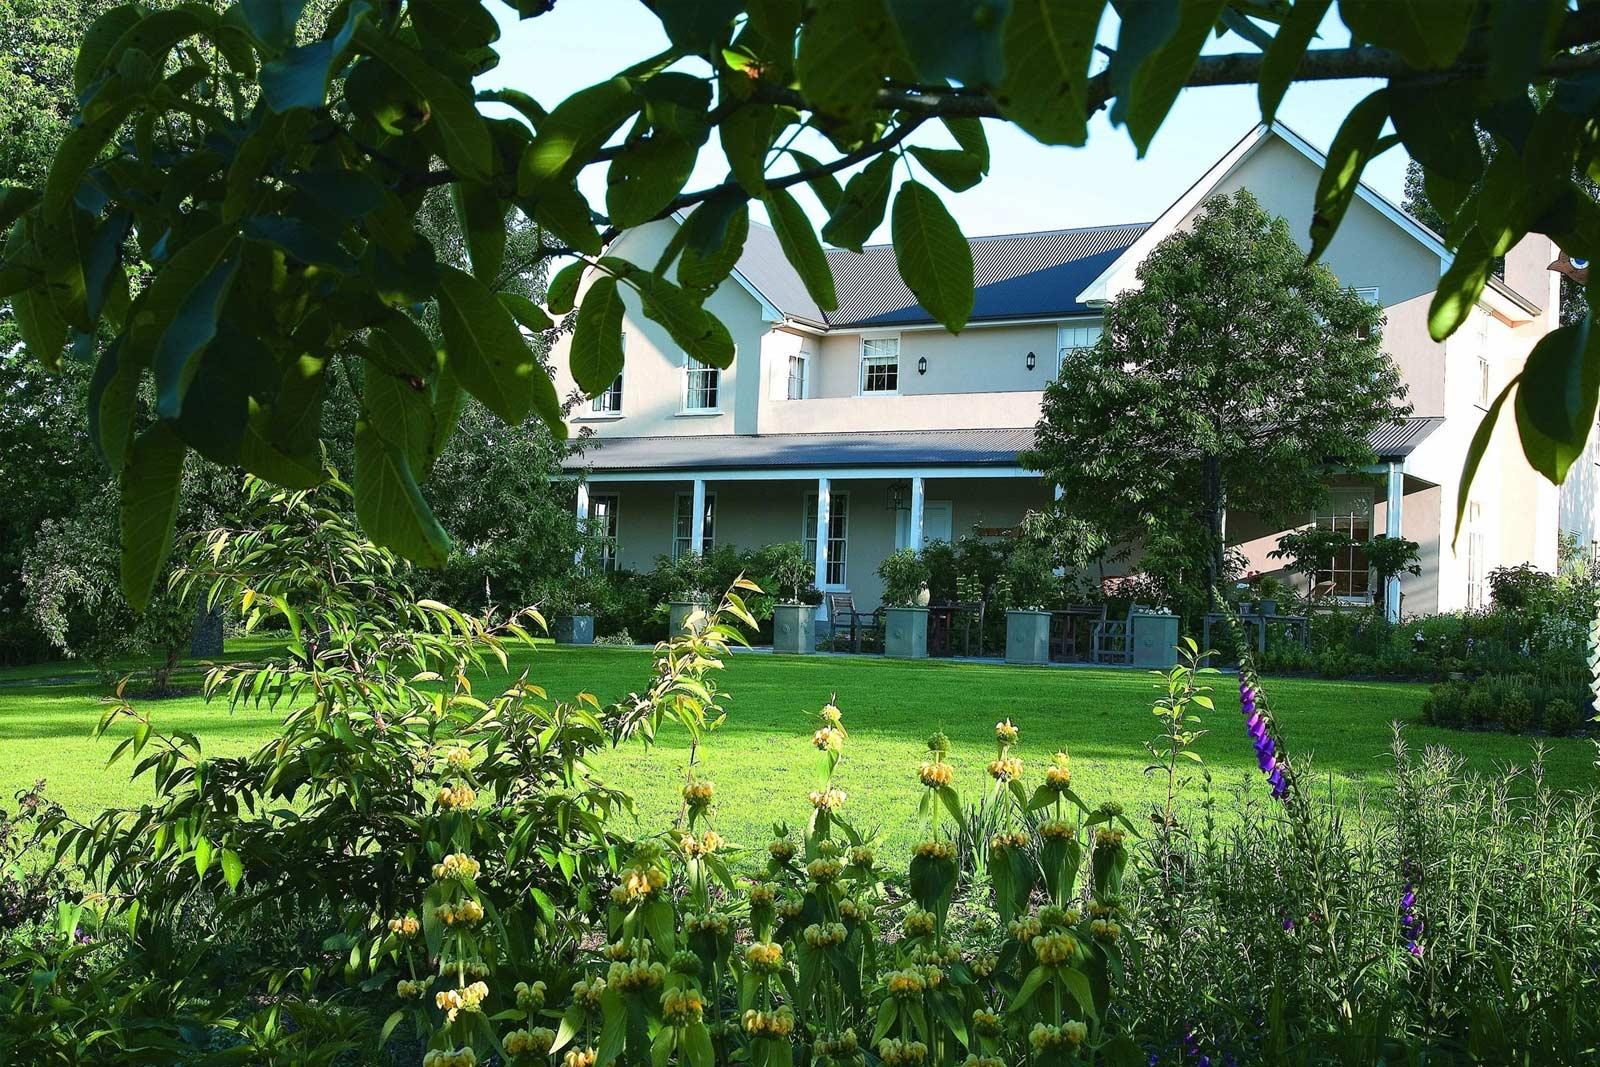 Serenity at Edenhouse